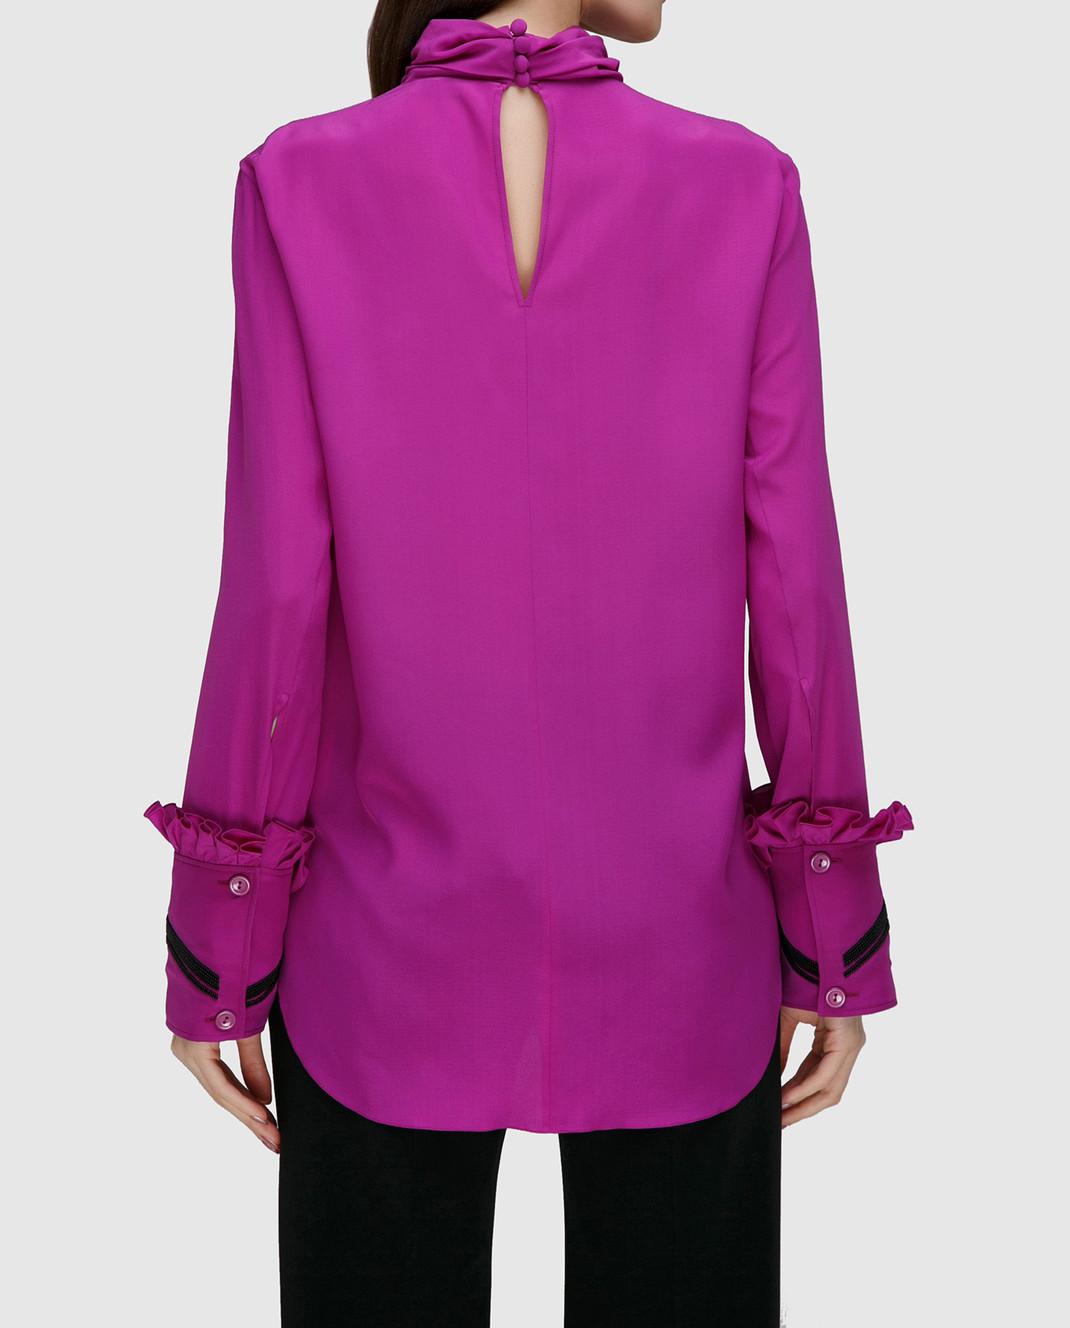 NINA RICCI Розовая блуза из шелка 17PCTO016SE0801 изображение 4